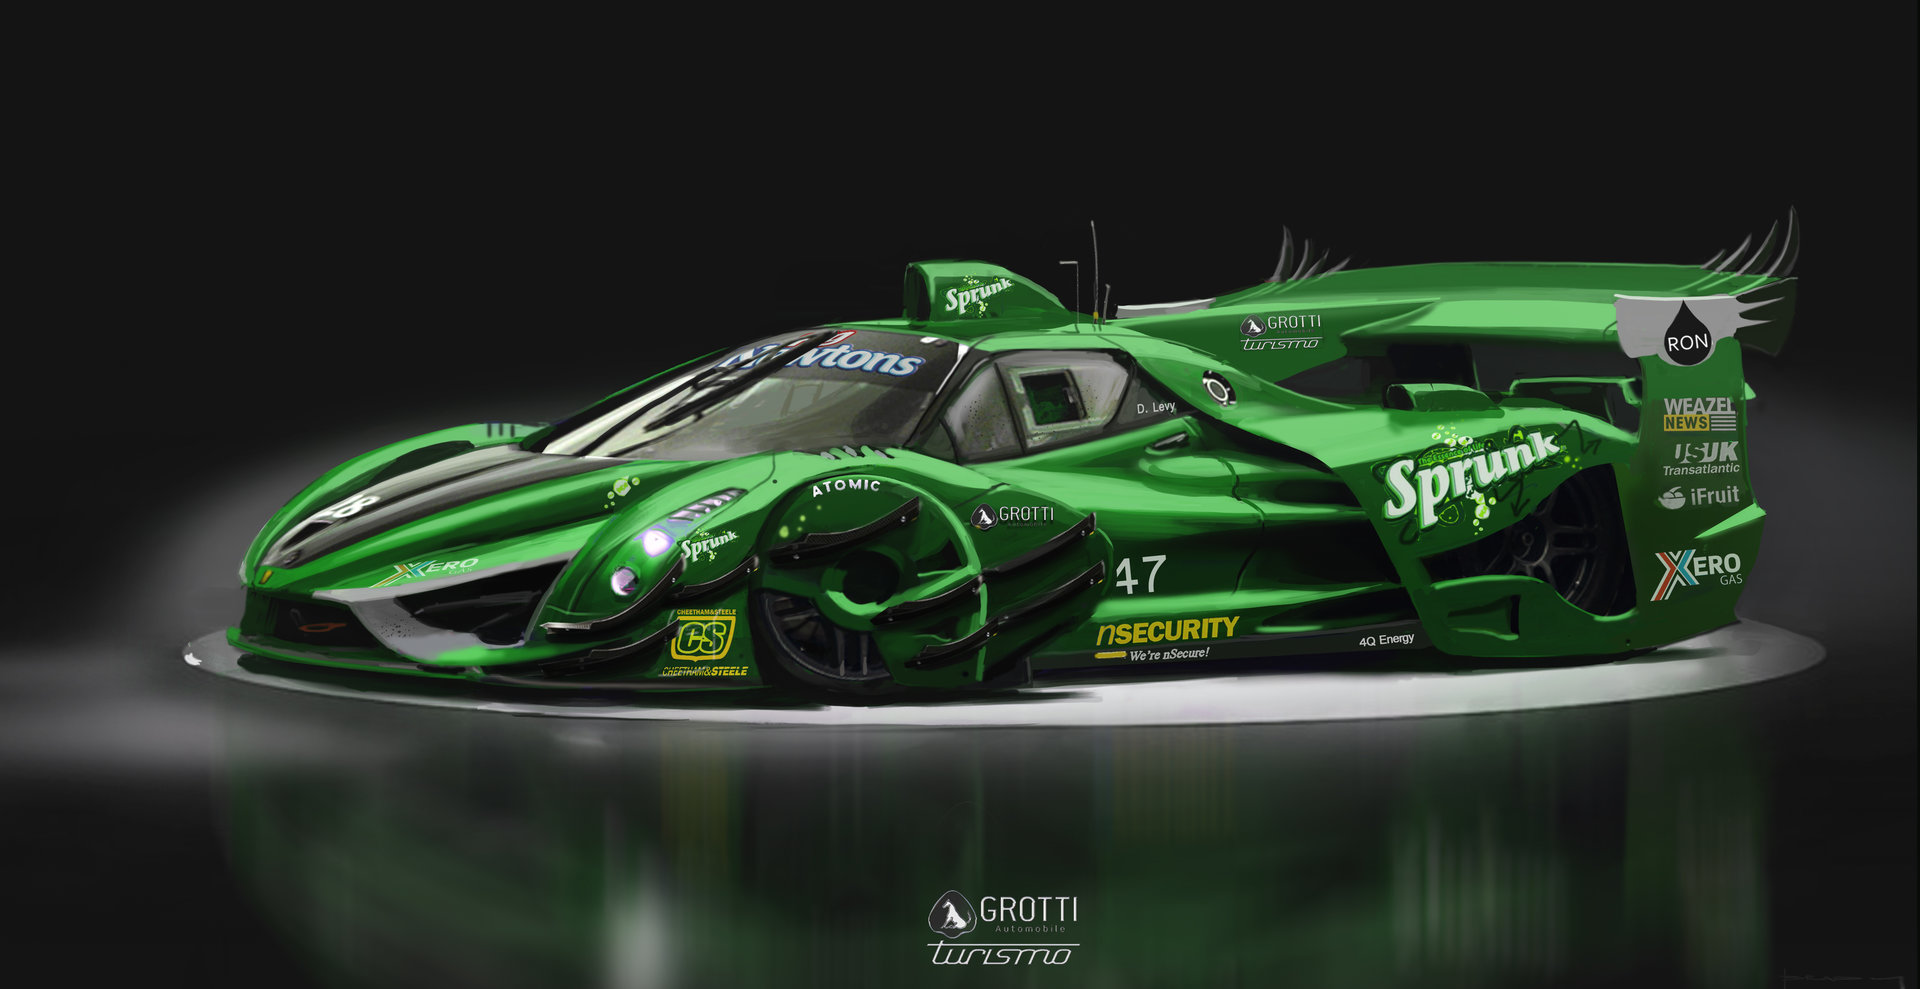 Alex brady racer tight green